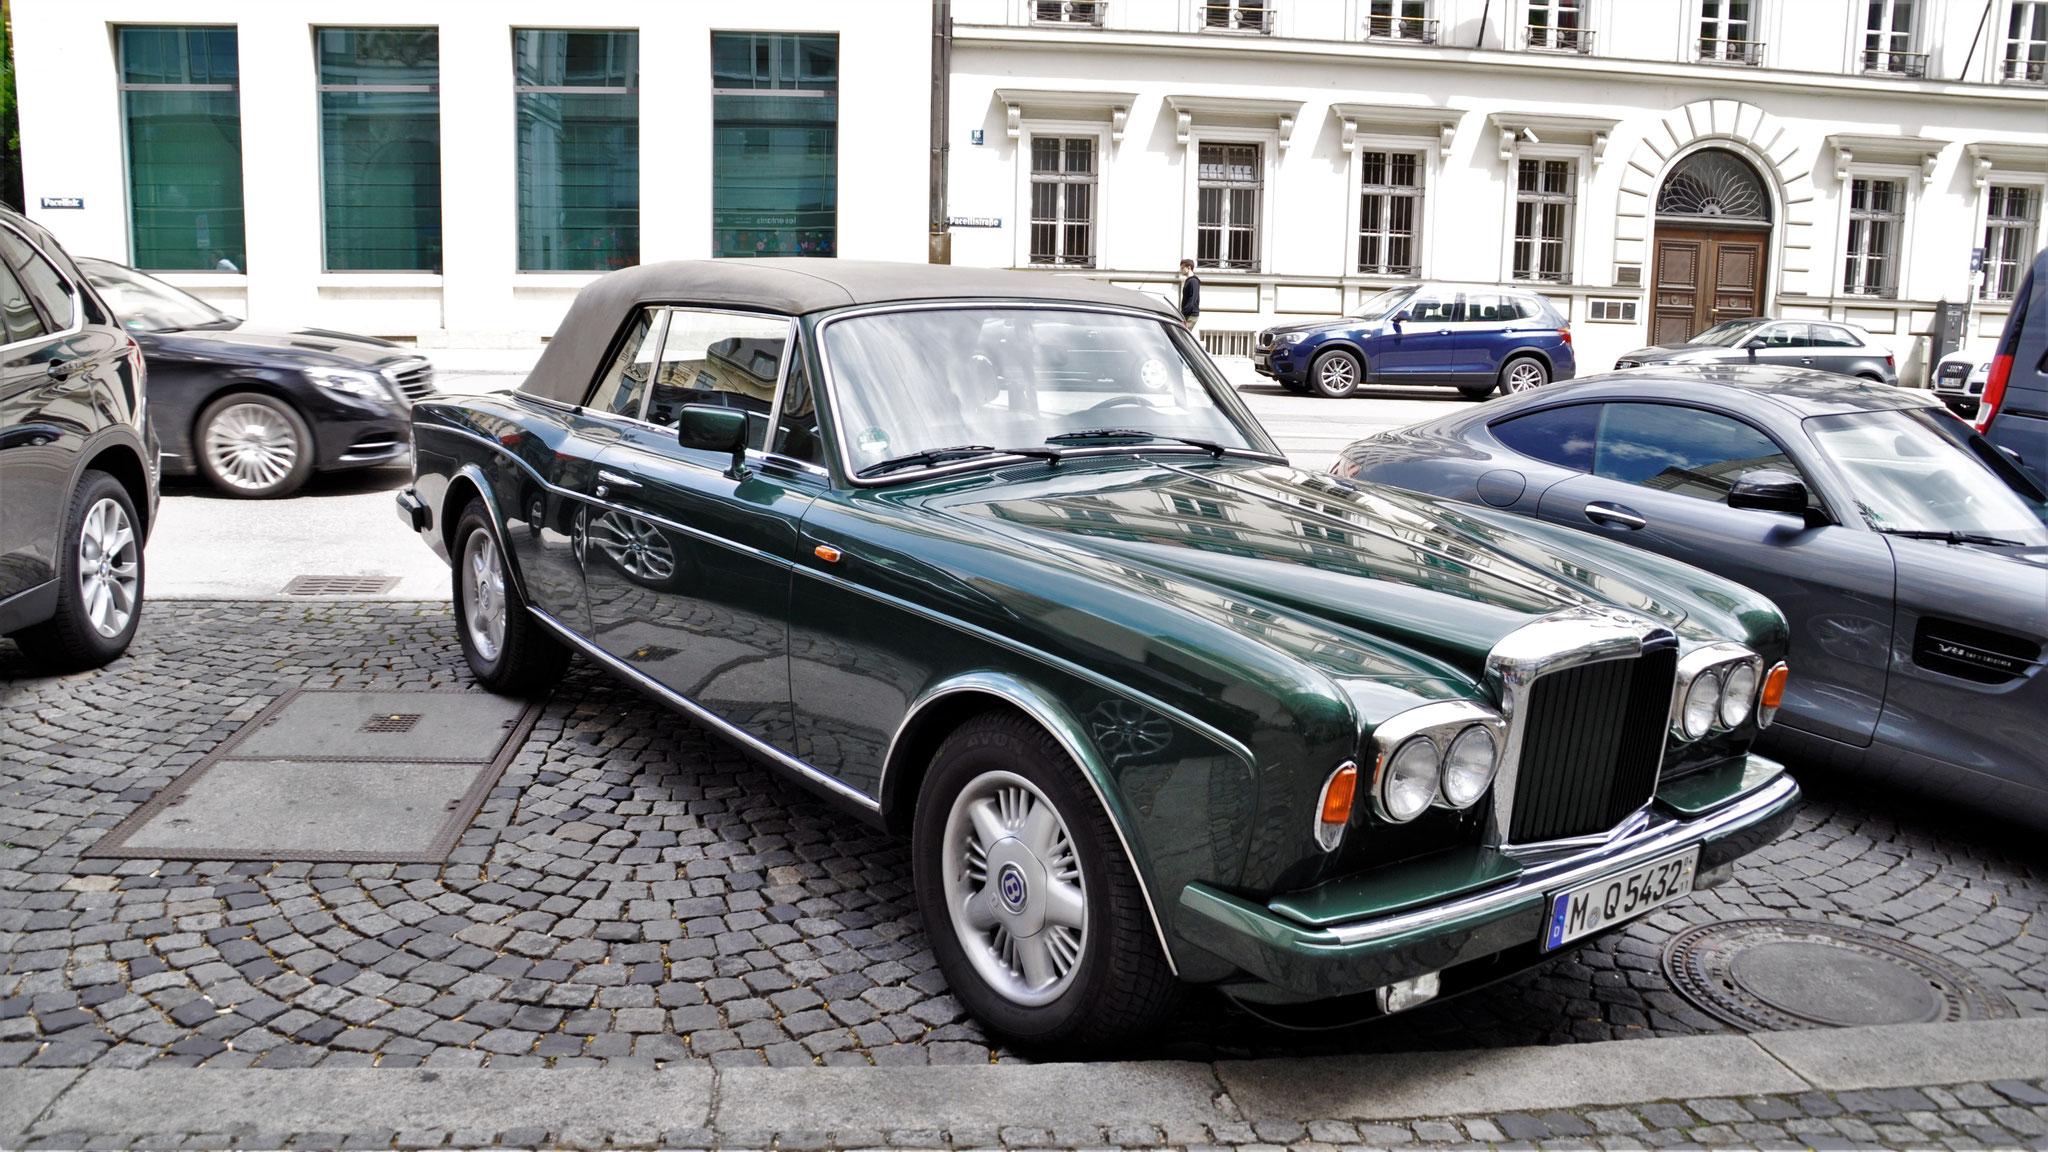 Bentley Corniche - M-Q-5432